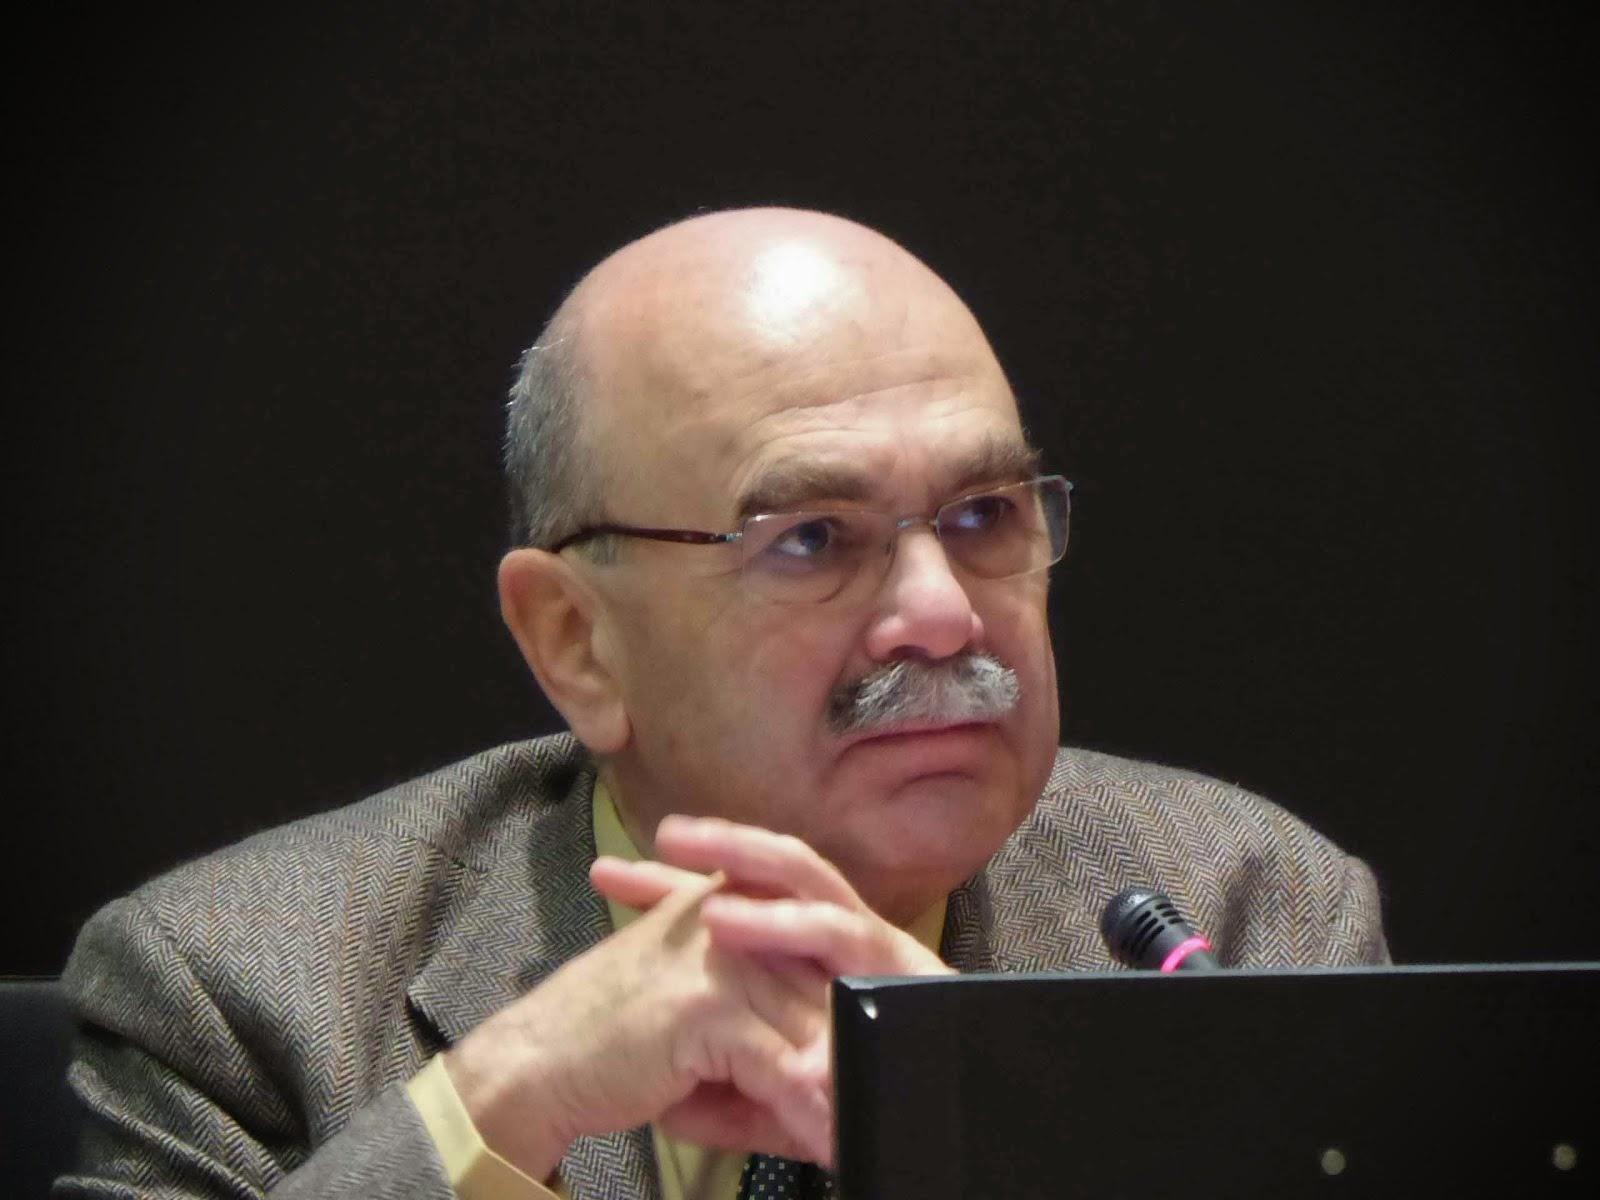 CONFERENCIA DR. JIMENEZ MARTÍN